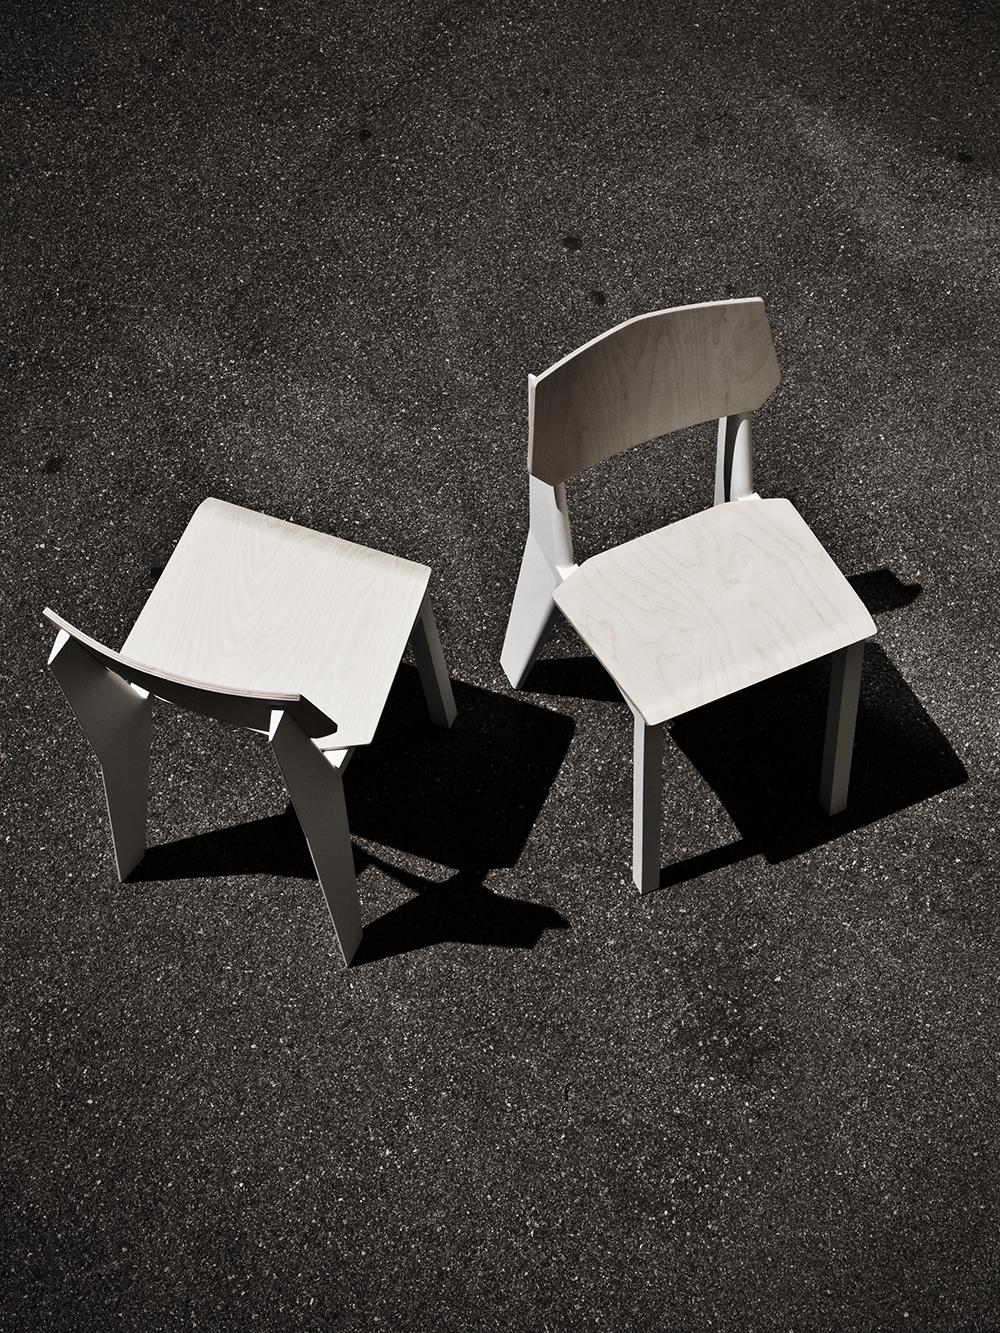 Standardo Chair